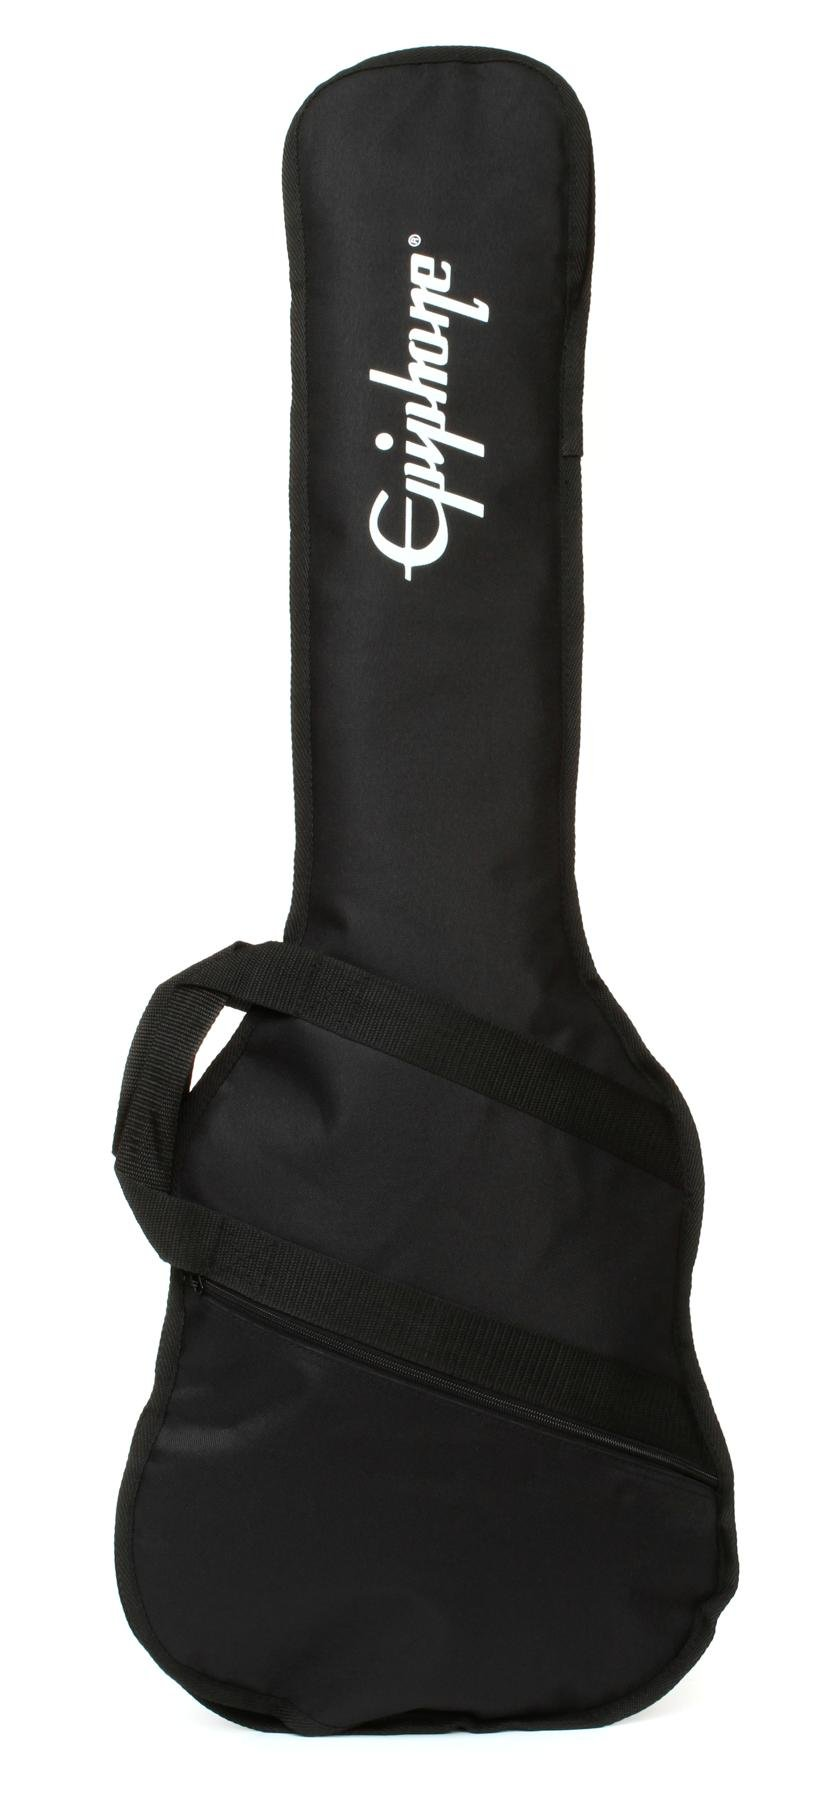 Epiphone Les Paul Express Gig Bag